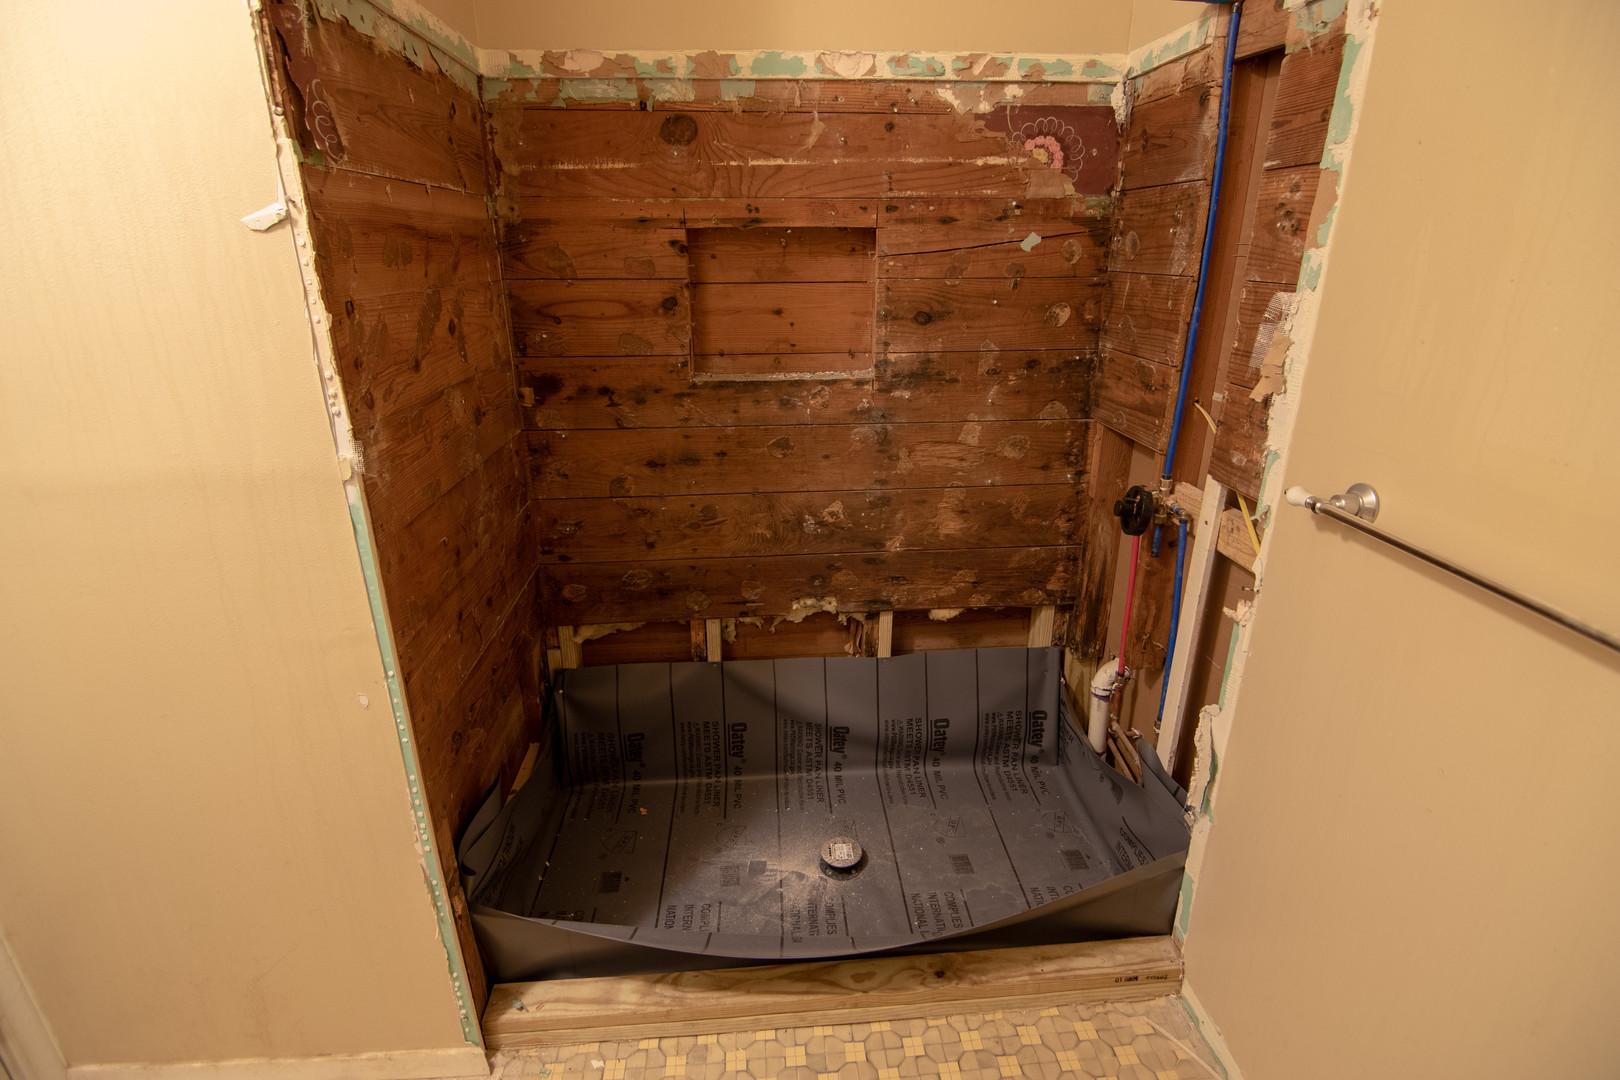 Subwall Before Bathroom Remodel